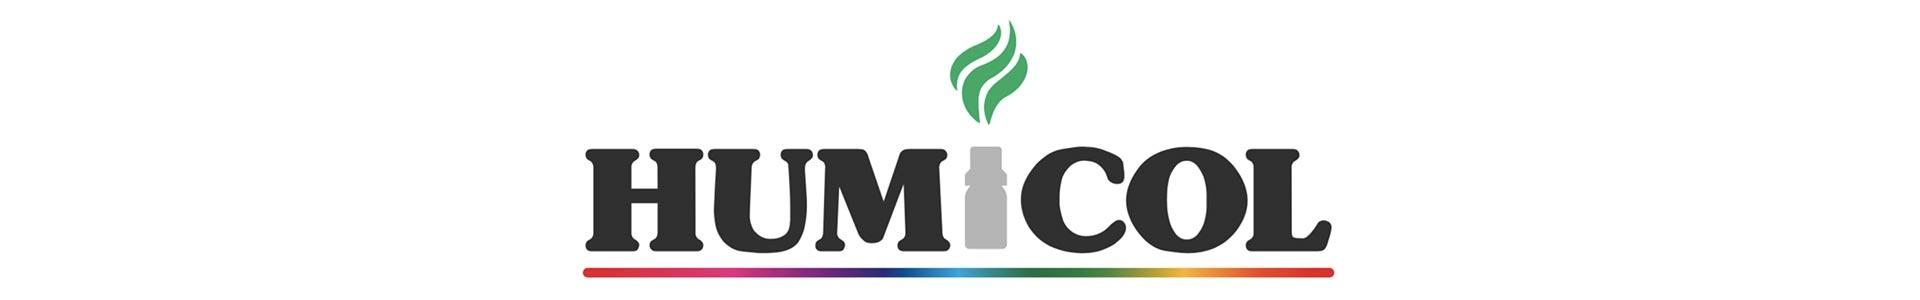 humicol-banner